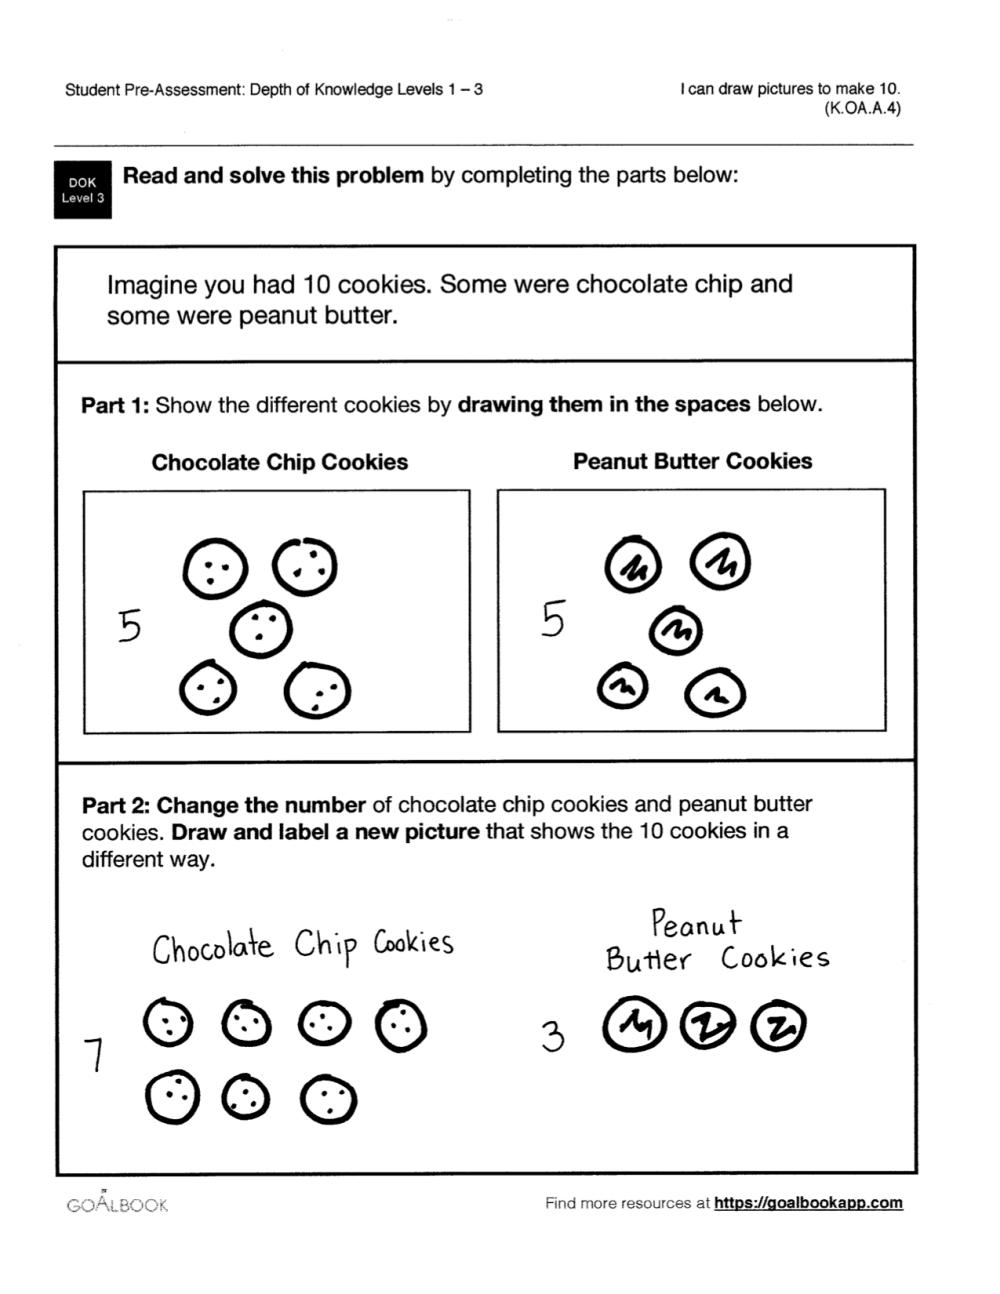 medium resolution of Algebraic Thinking Pastures Worksheet   Printable Worksheets and Activities  for Teachers